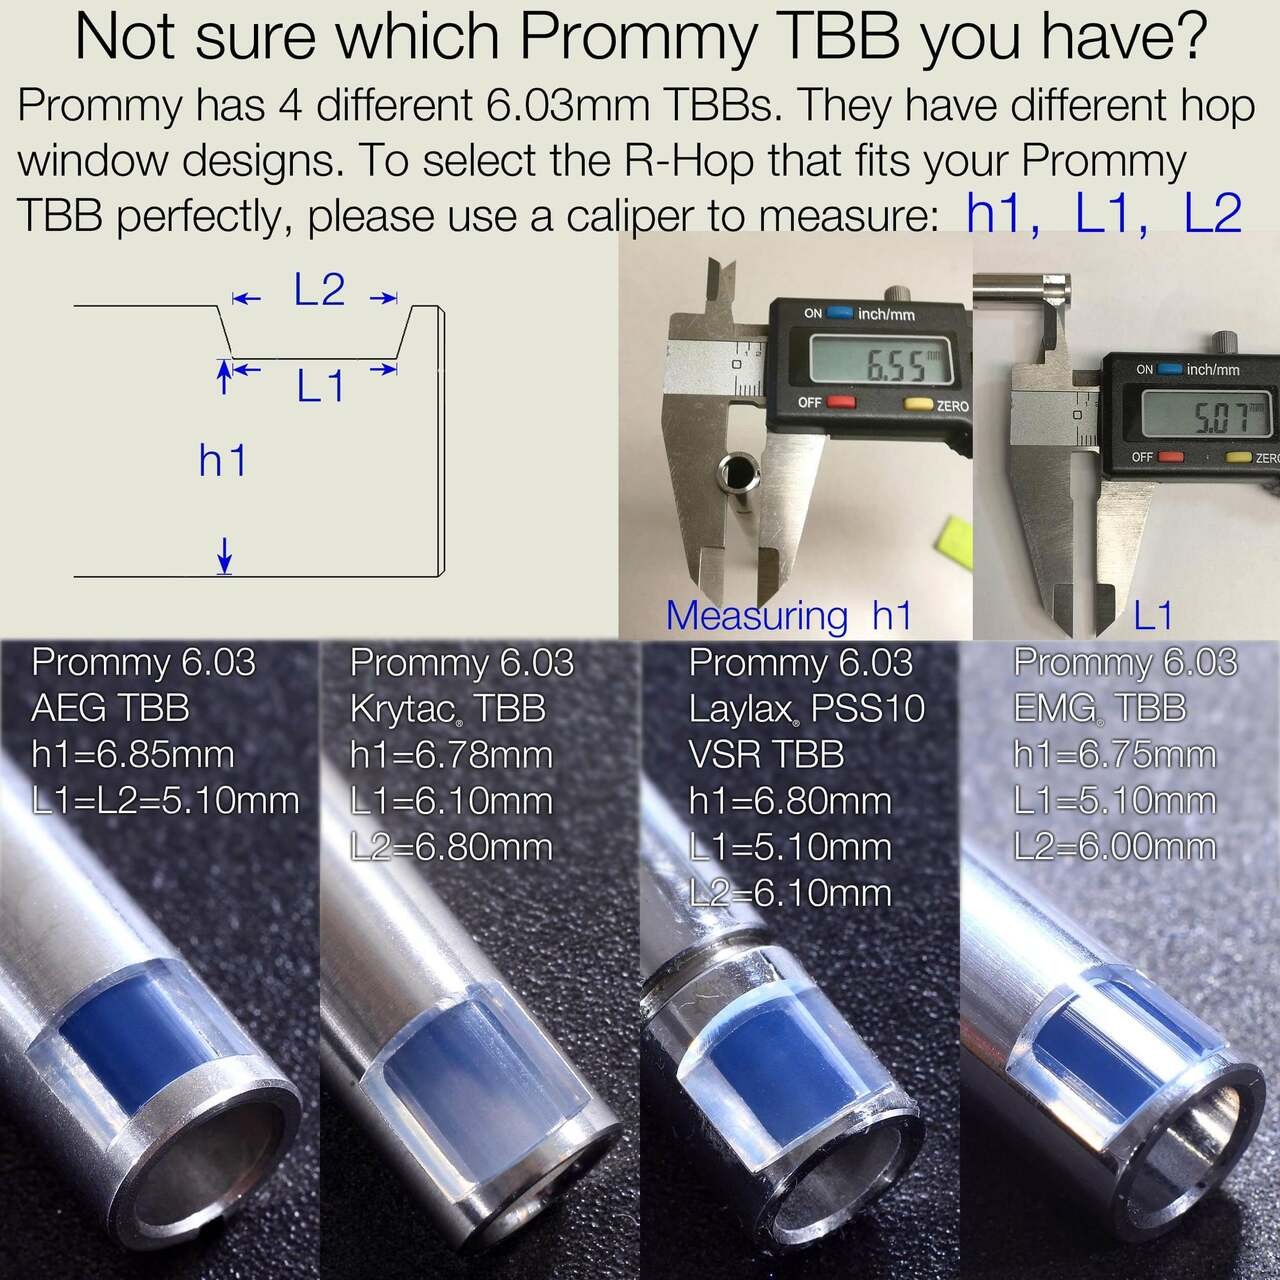 All the types of Prometheus Barrels